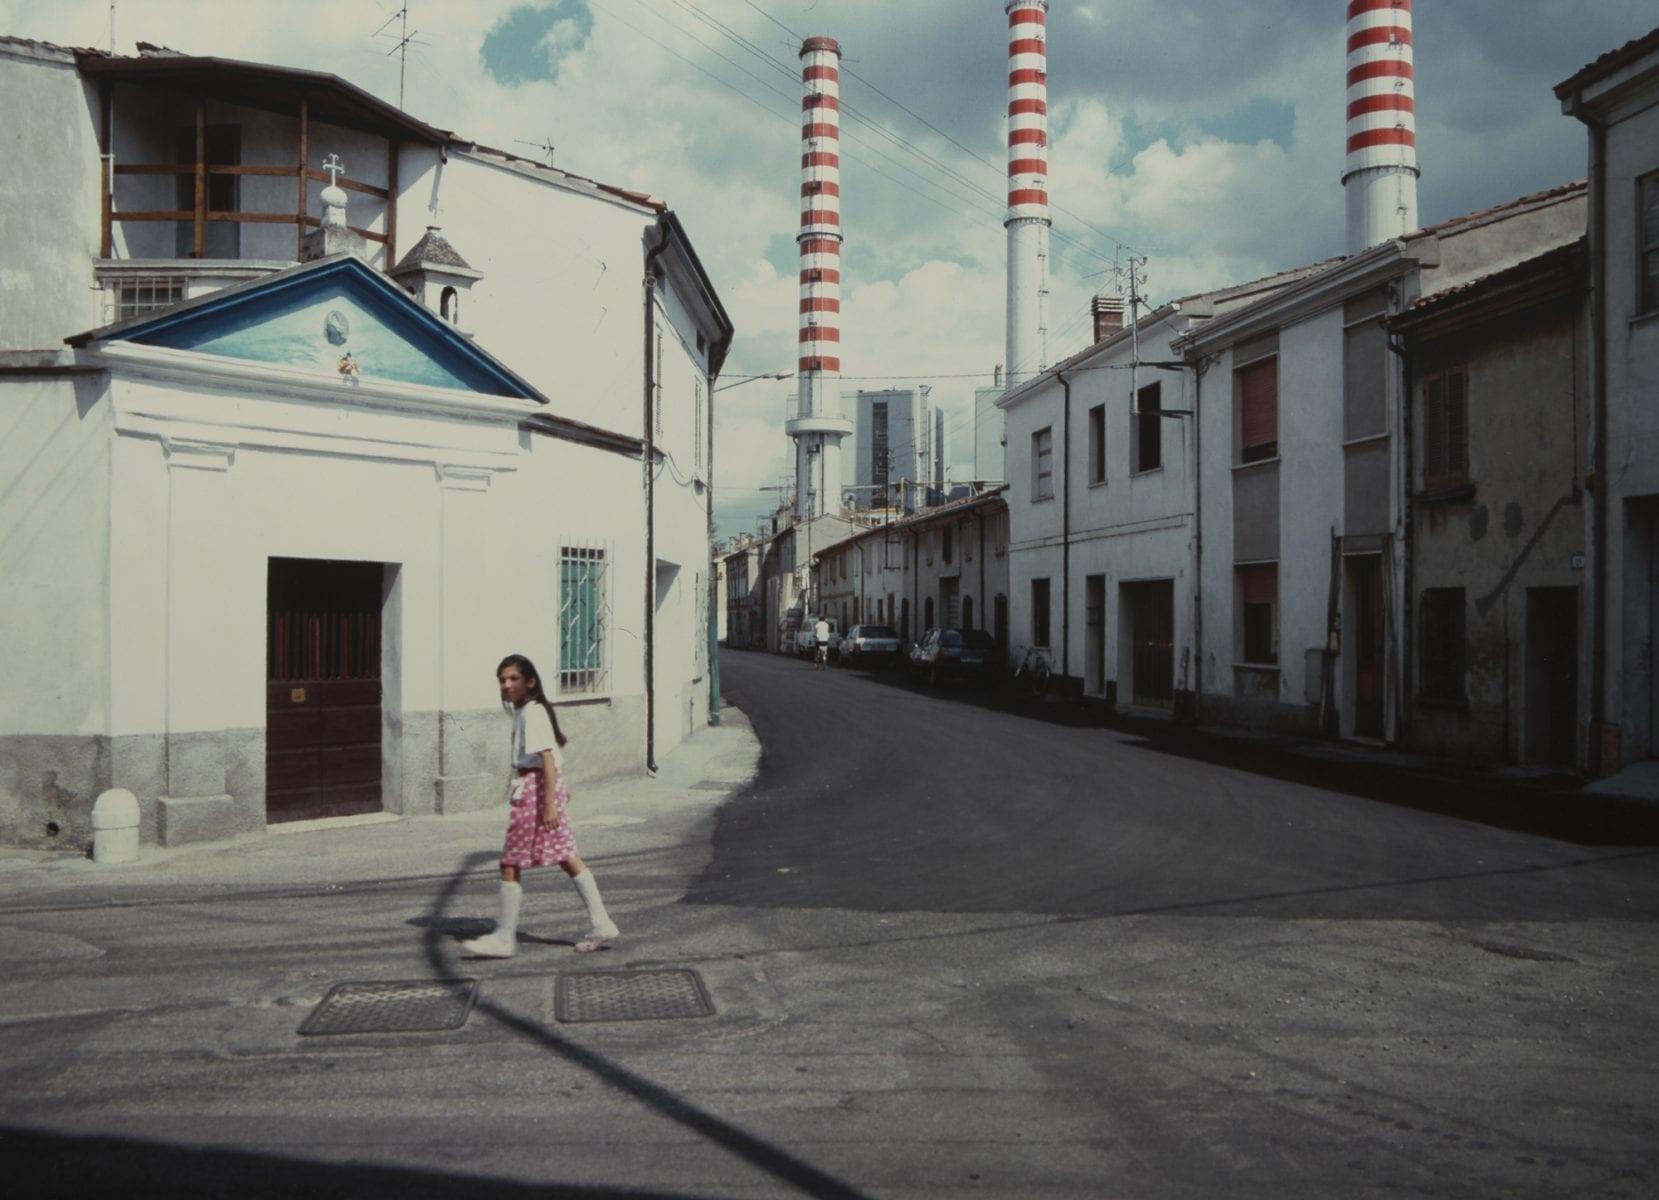 Color Photography by Luigi Ghirri Centrale Elettrica (Power Plant), Ostiglia, Italy 1987